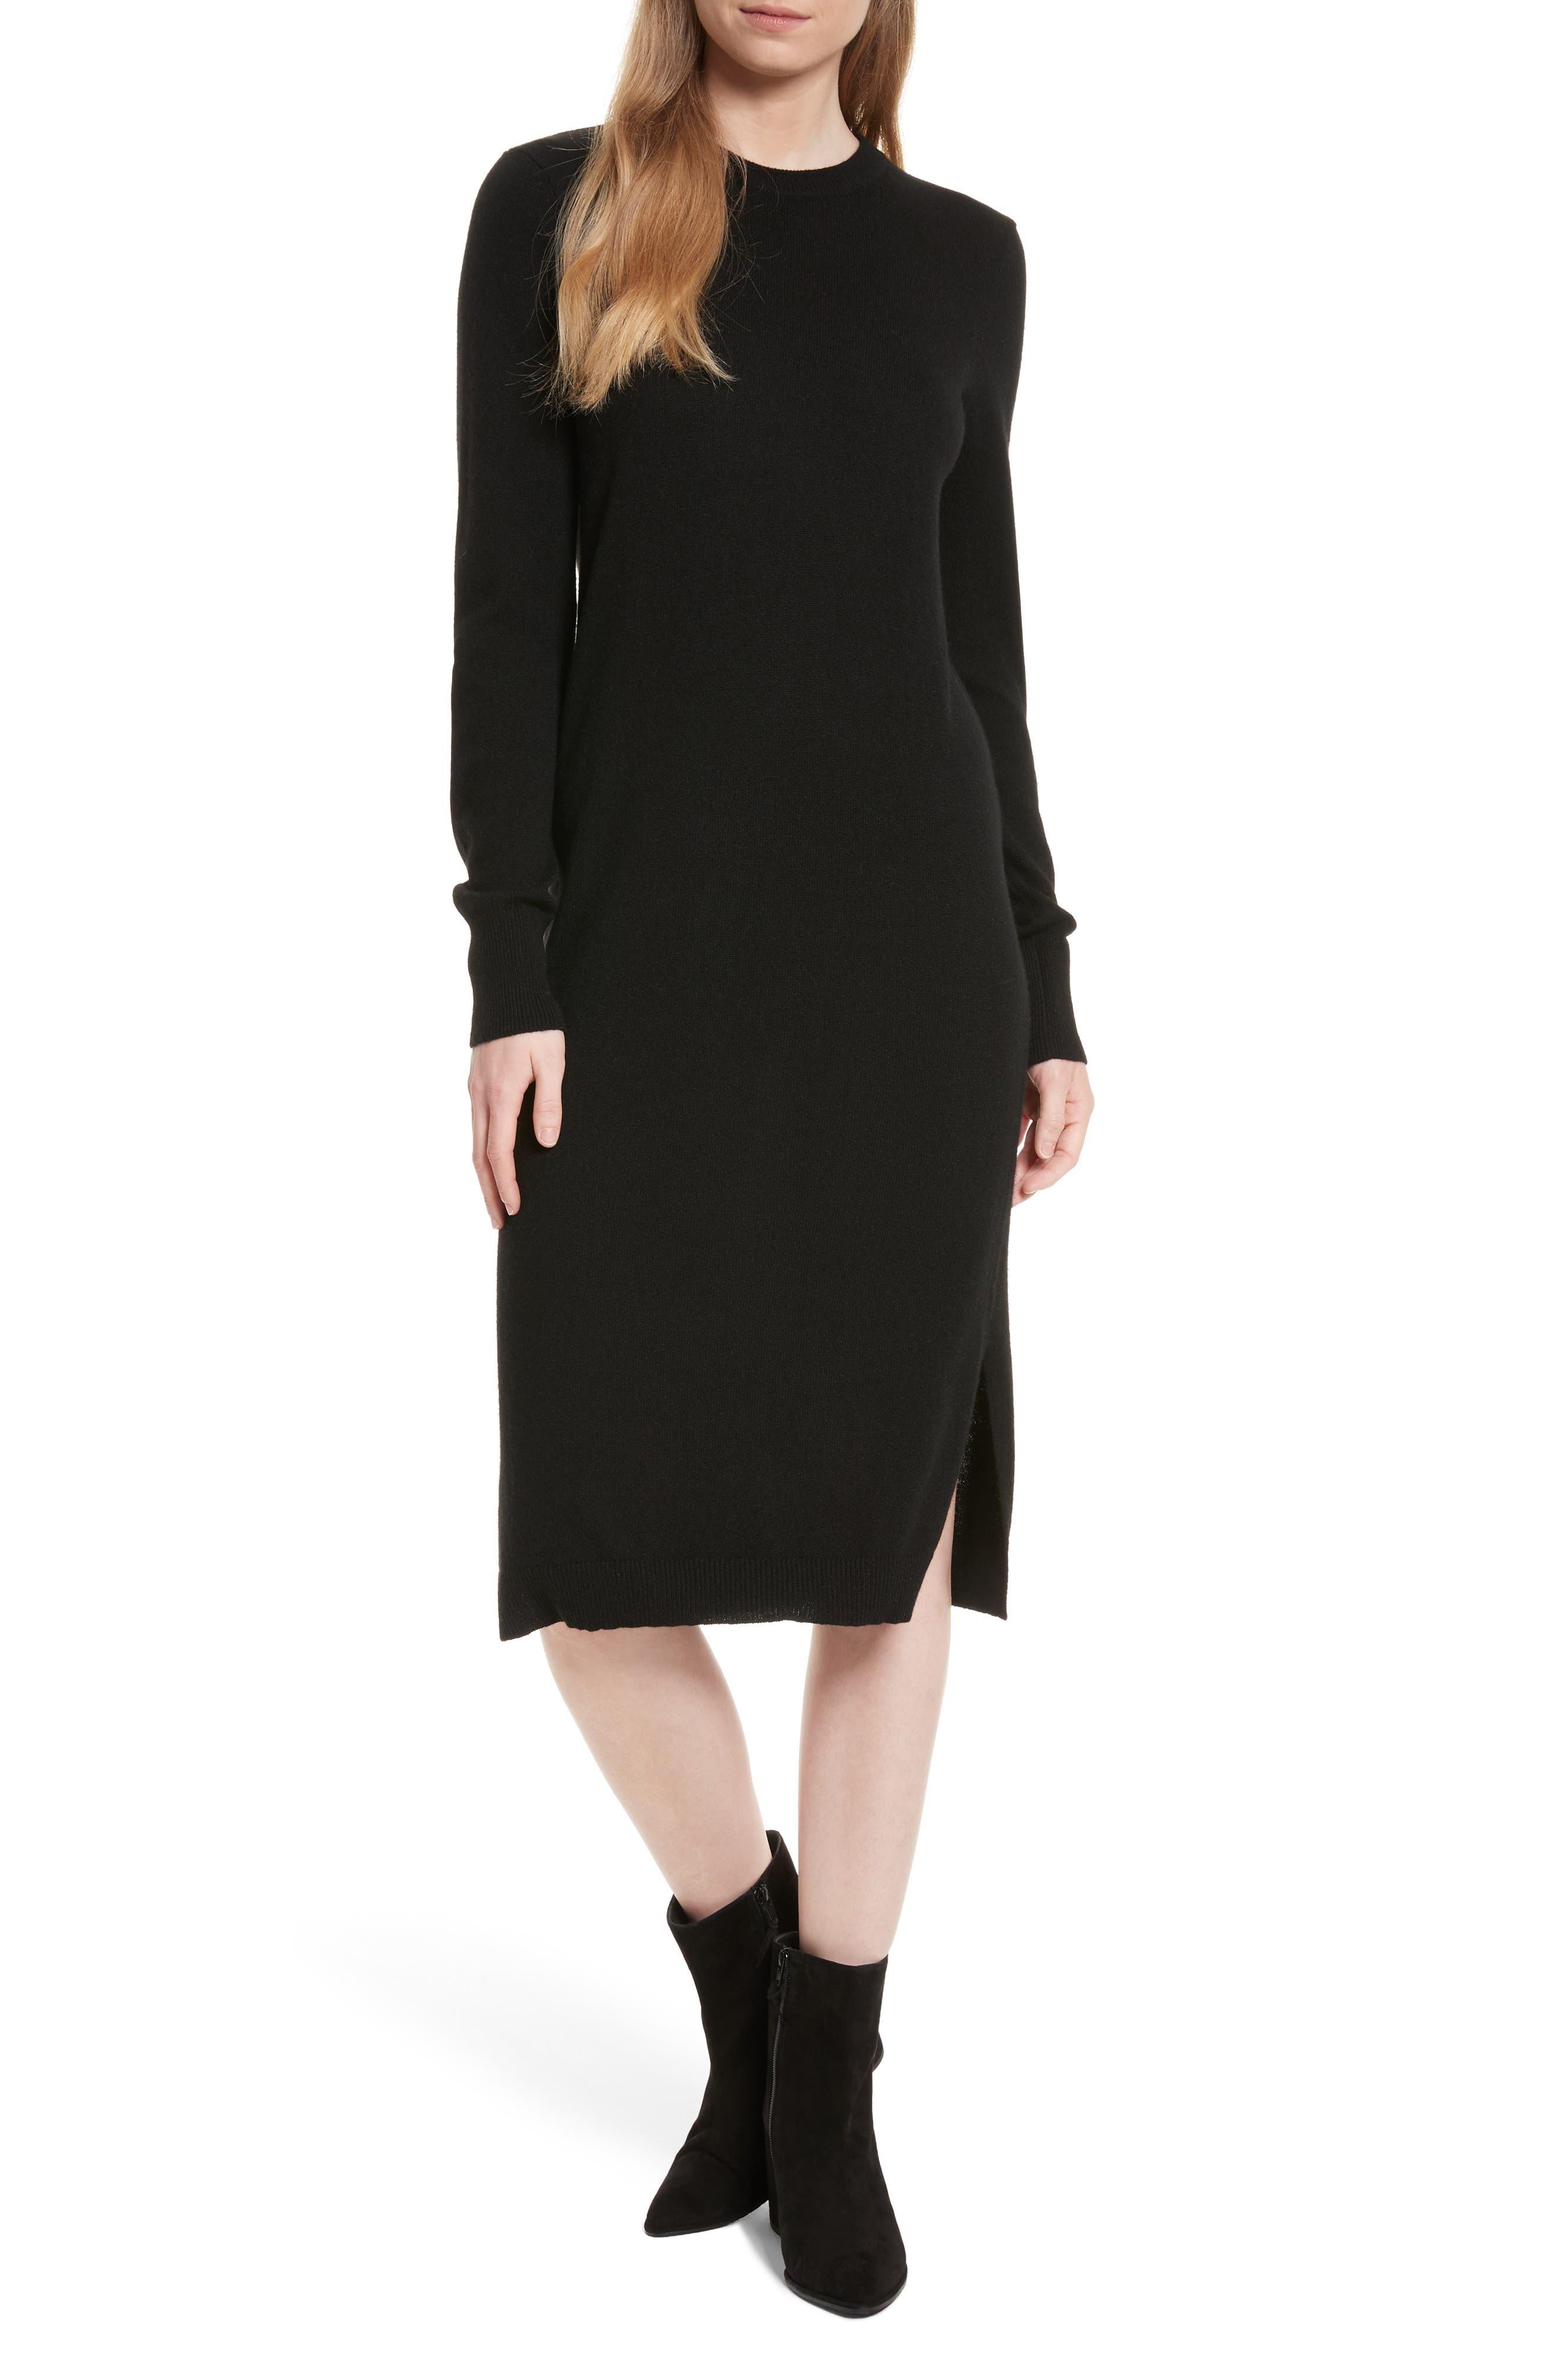 Alternate Image 1 Selected - Equipment Snyder Cashmere Knit Midi Dress